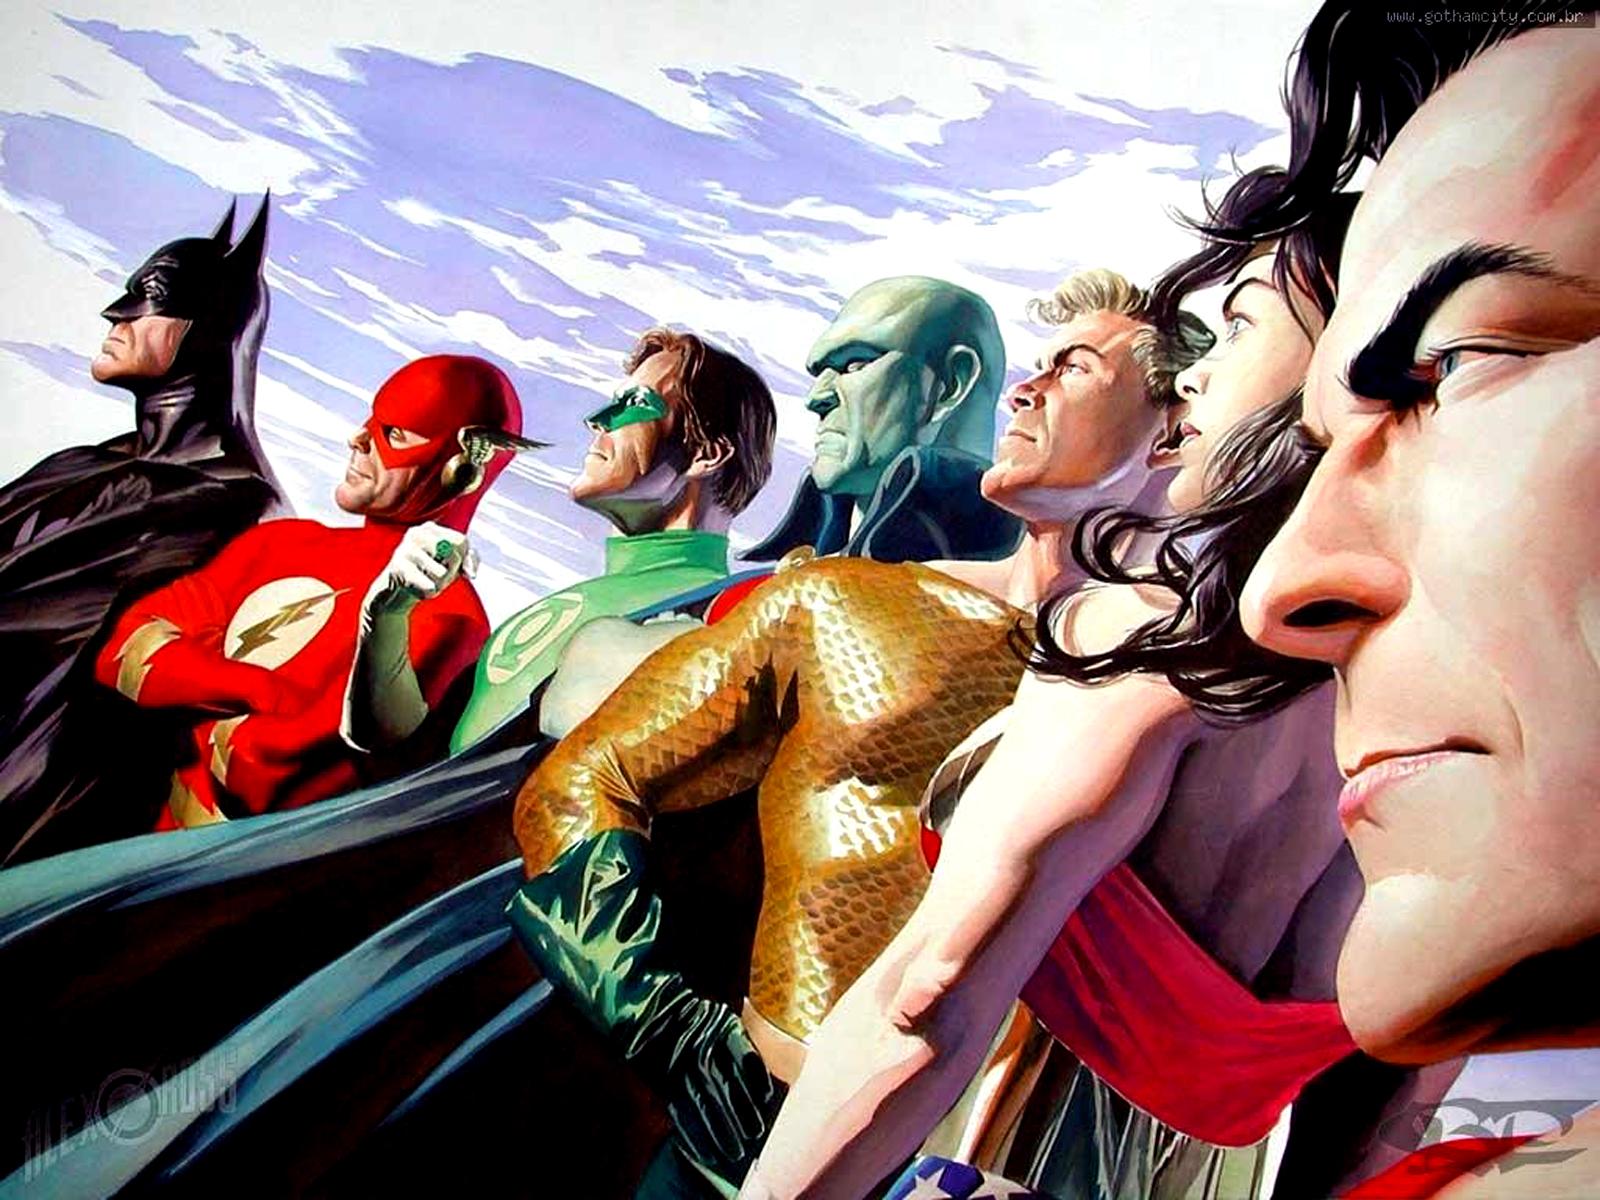 DC Comics Super Heroes HD Wallpaper wwwVvallpaperNet 2jpg 1600x1200